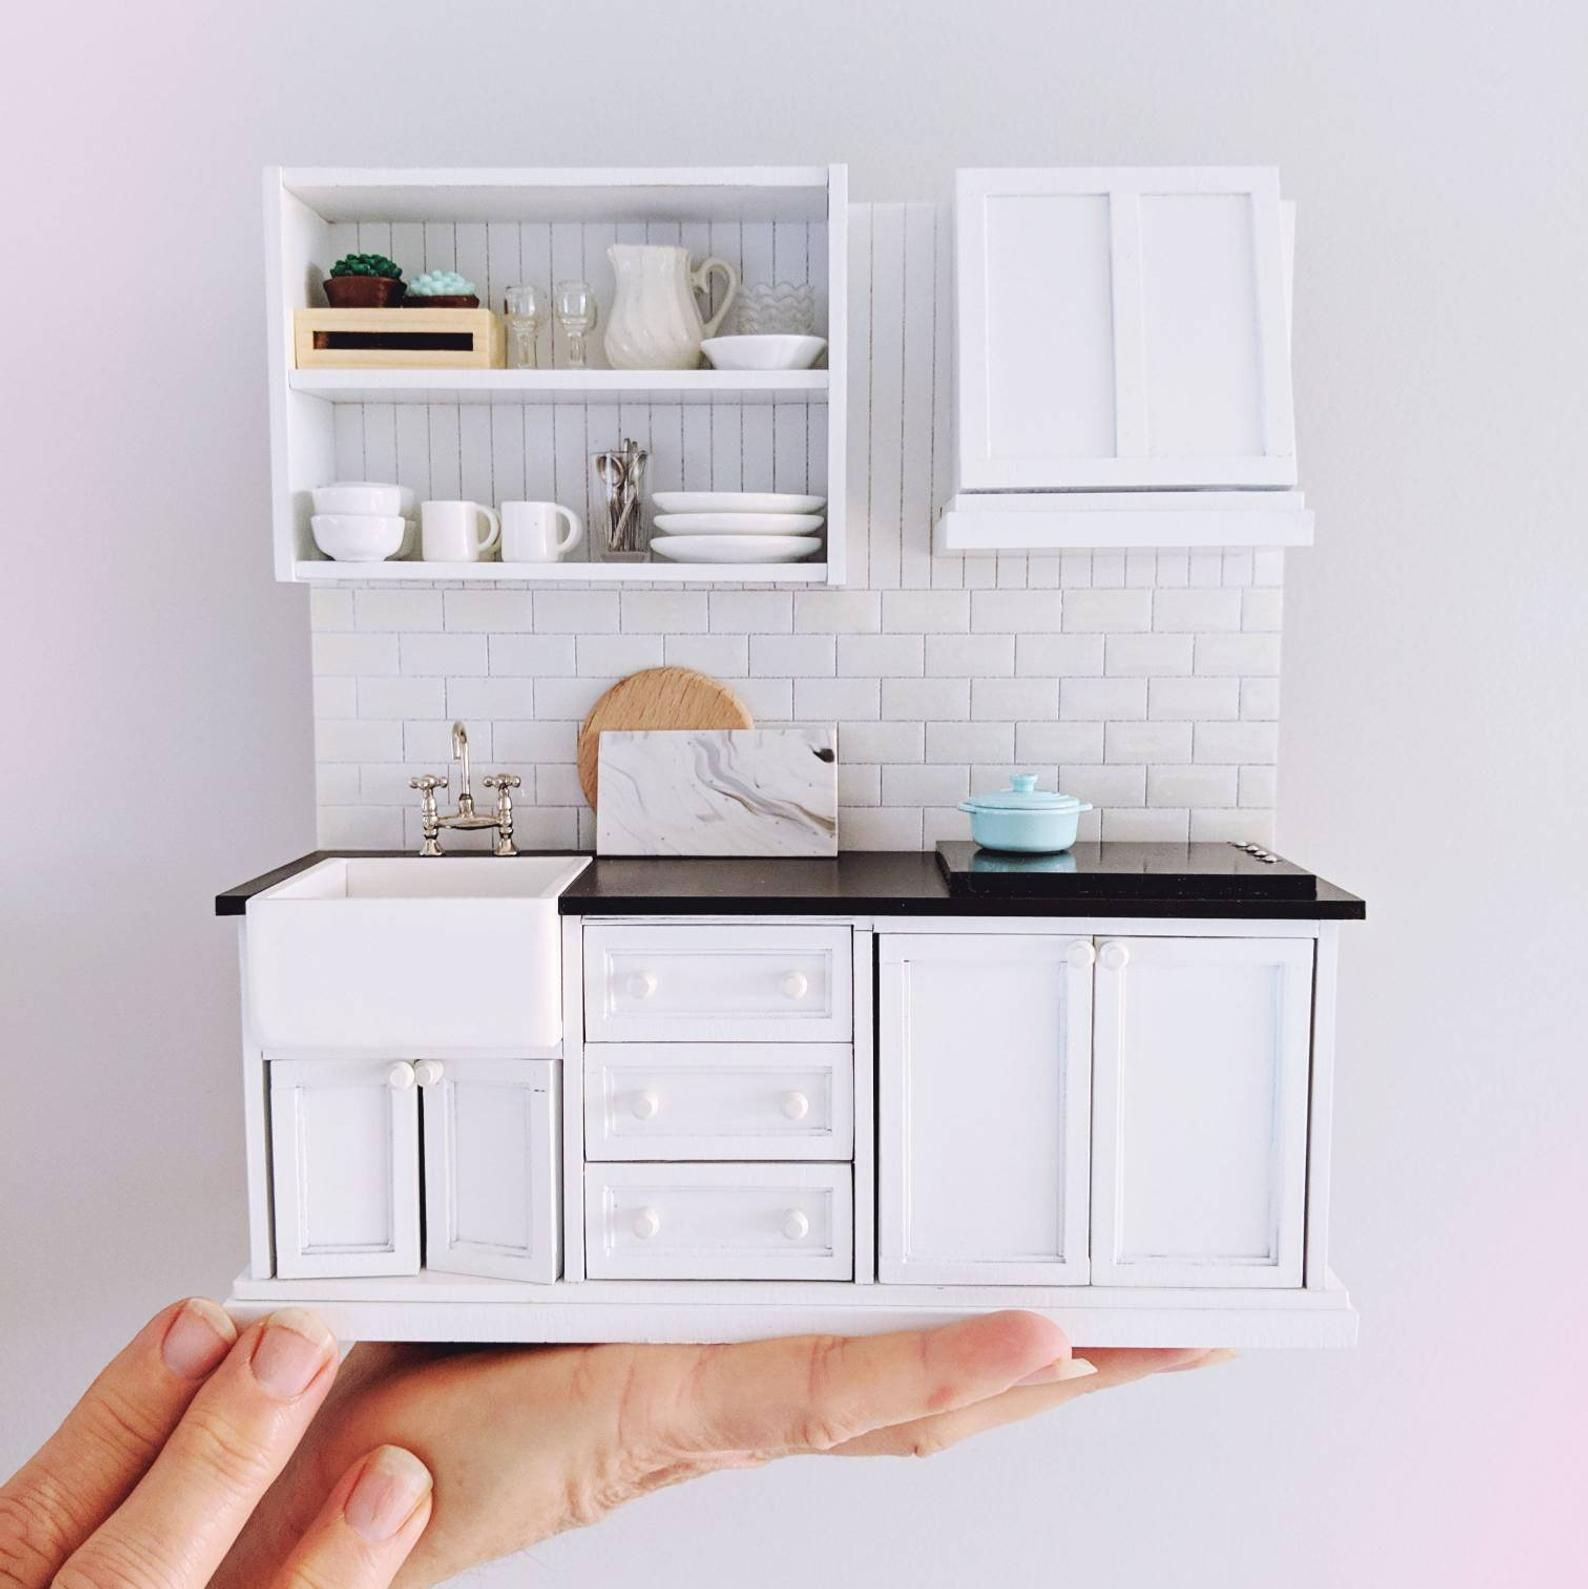 Miniature kitchen, modern kitchen for dollhouse, farmhouse kitchen, functional mini kitchen, mini modern dollhouse furniture #dollhousefurniture